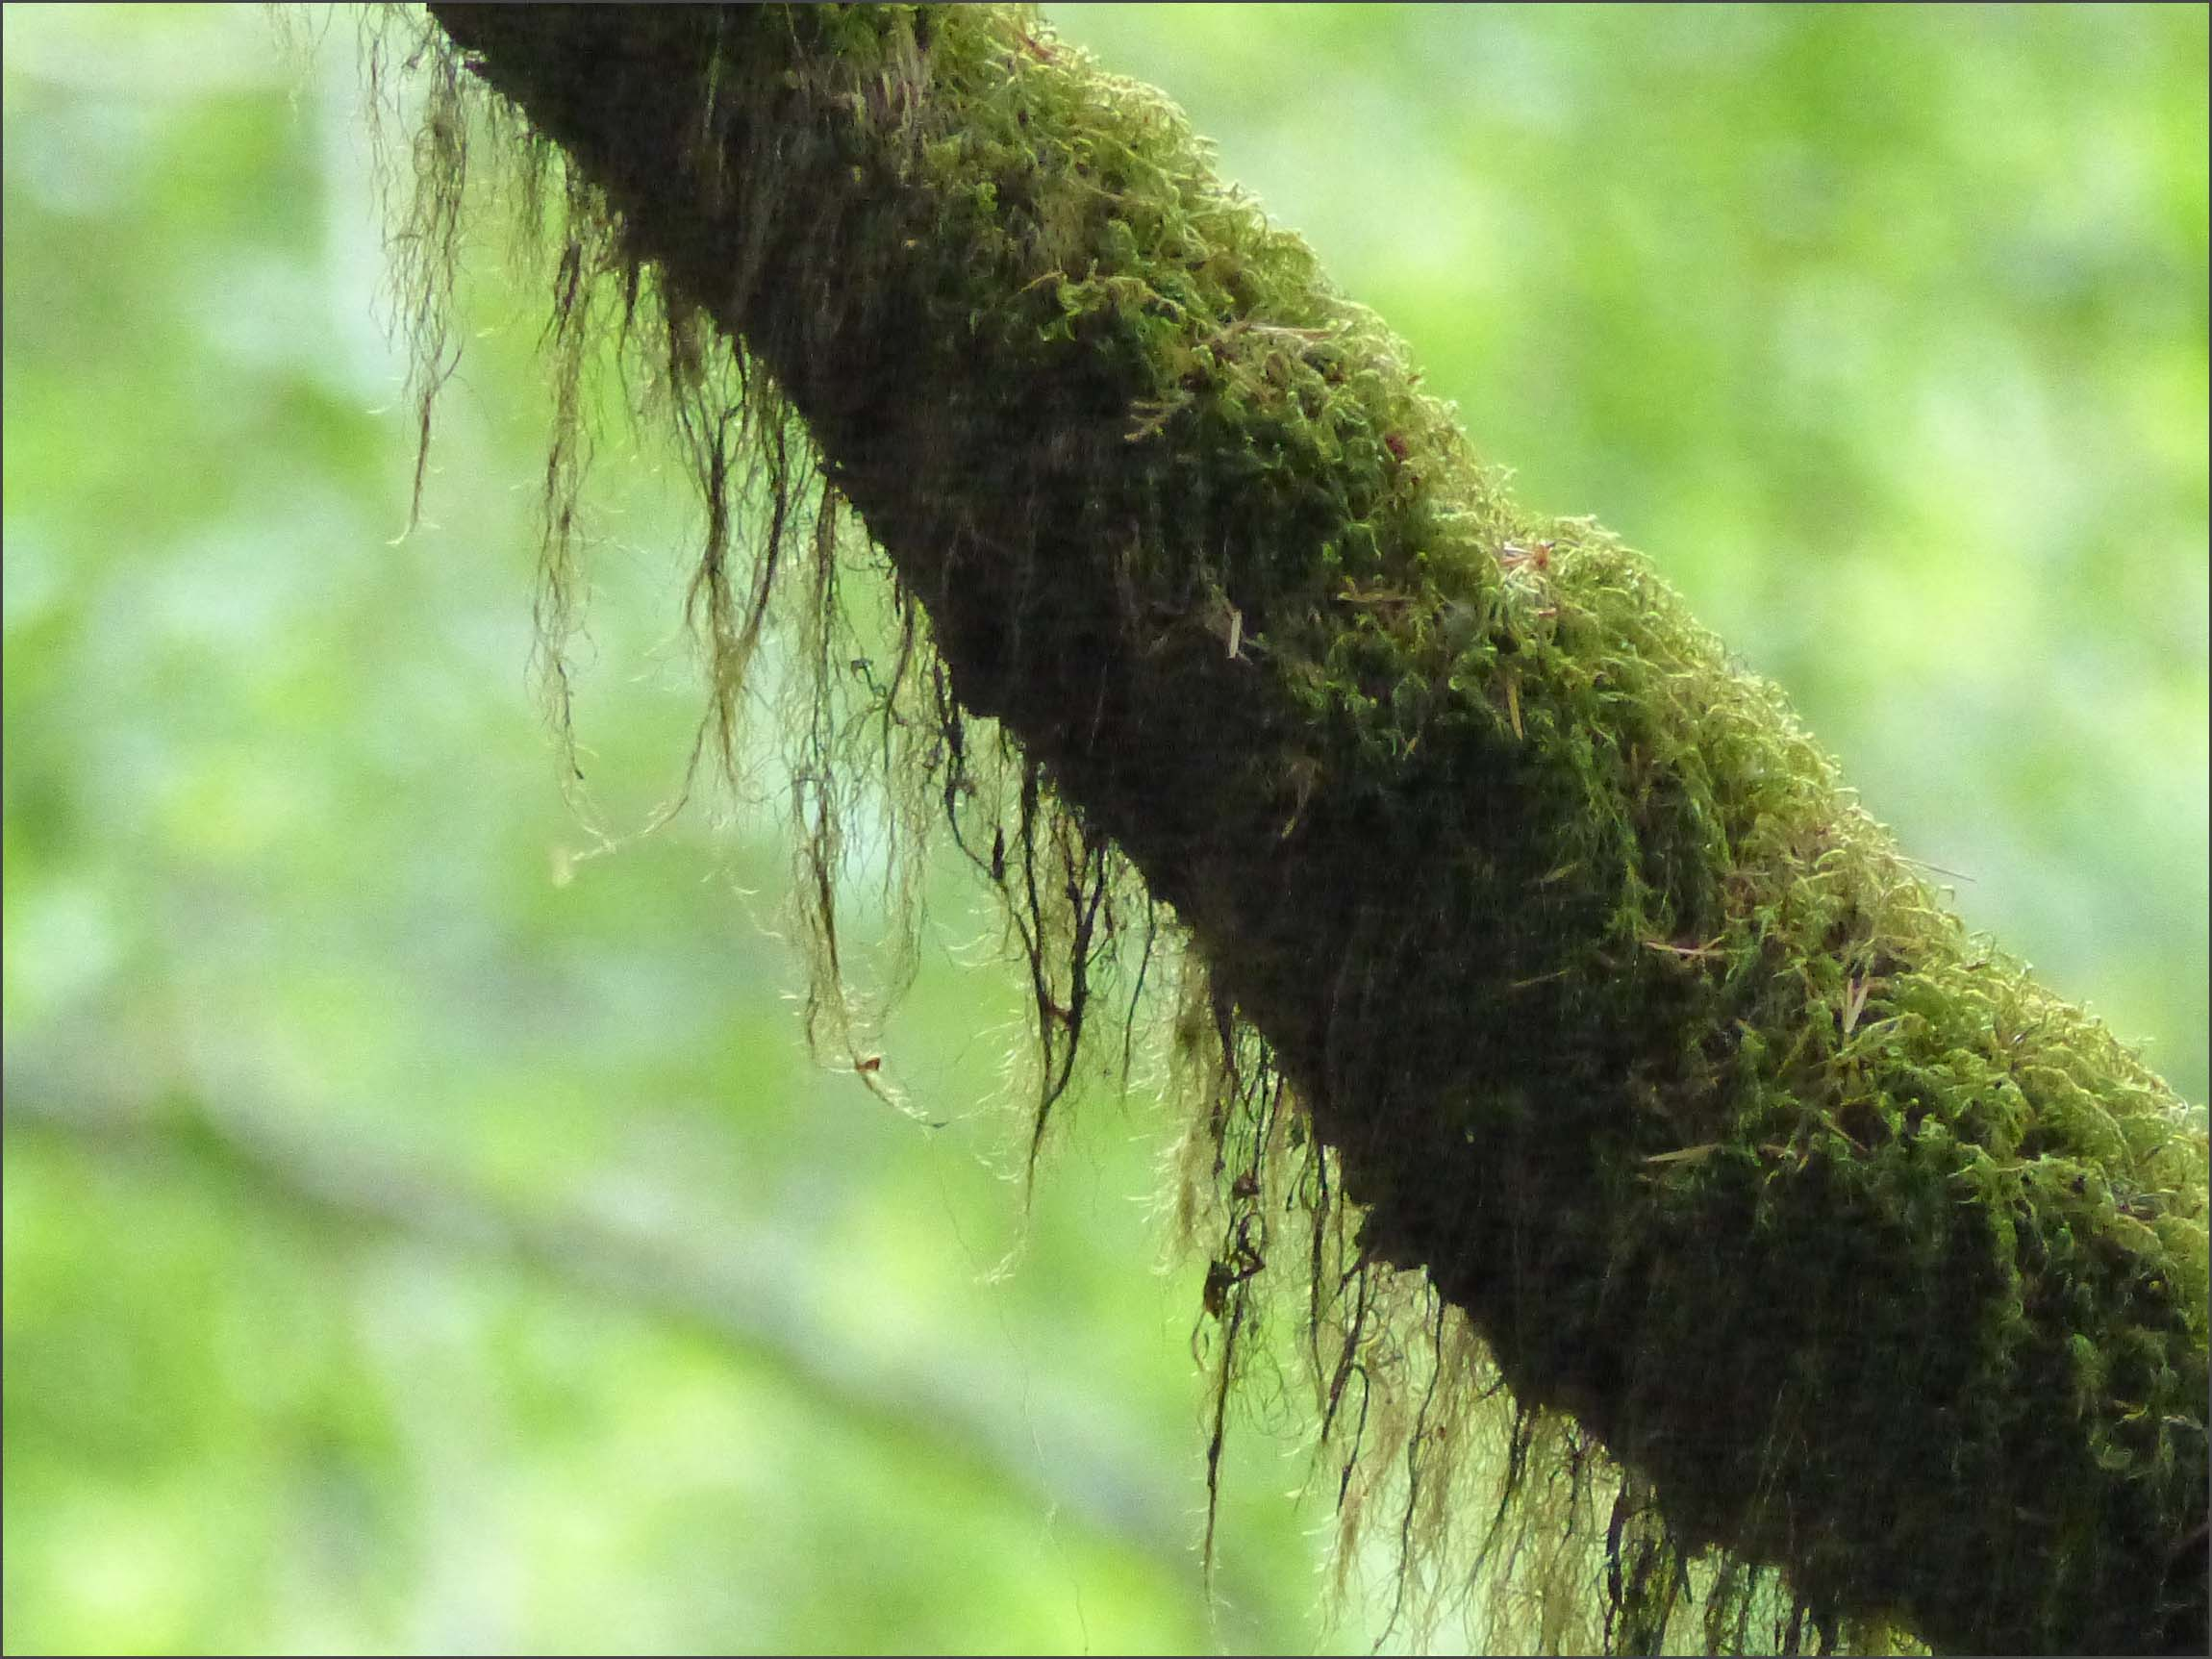 Tree branch draped with lichen